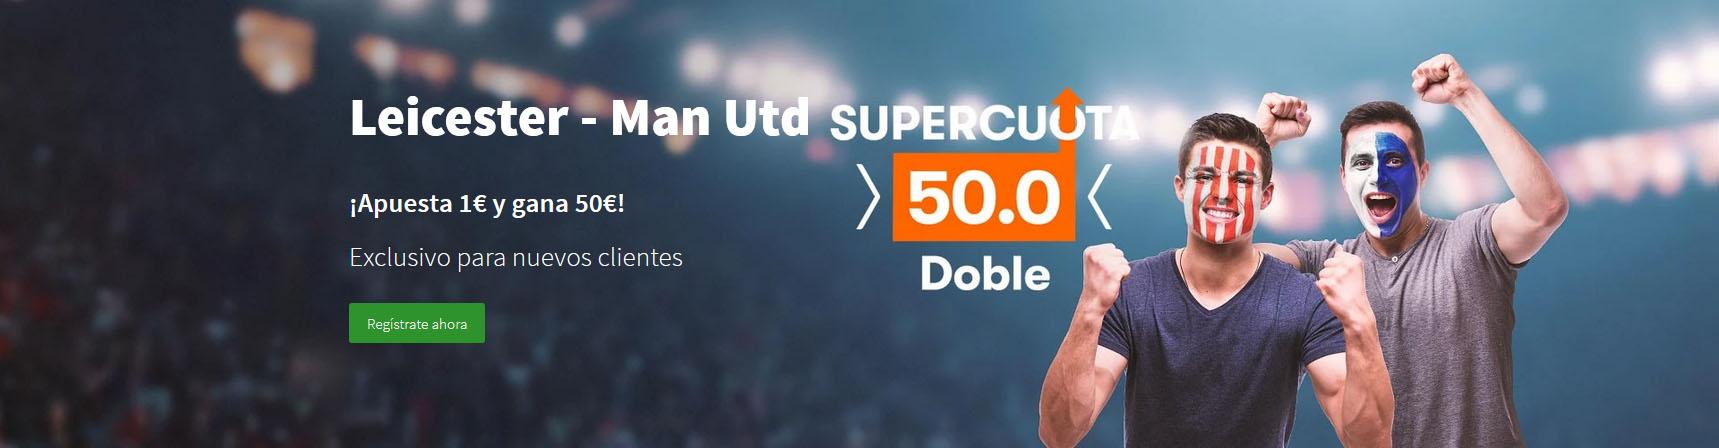 Supercuota United vence a Leicester